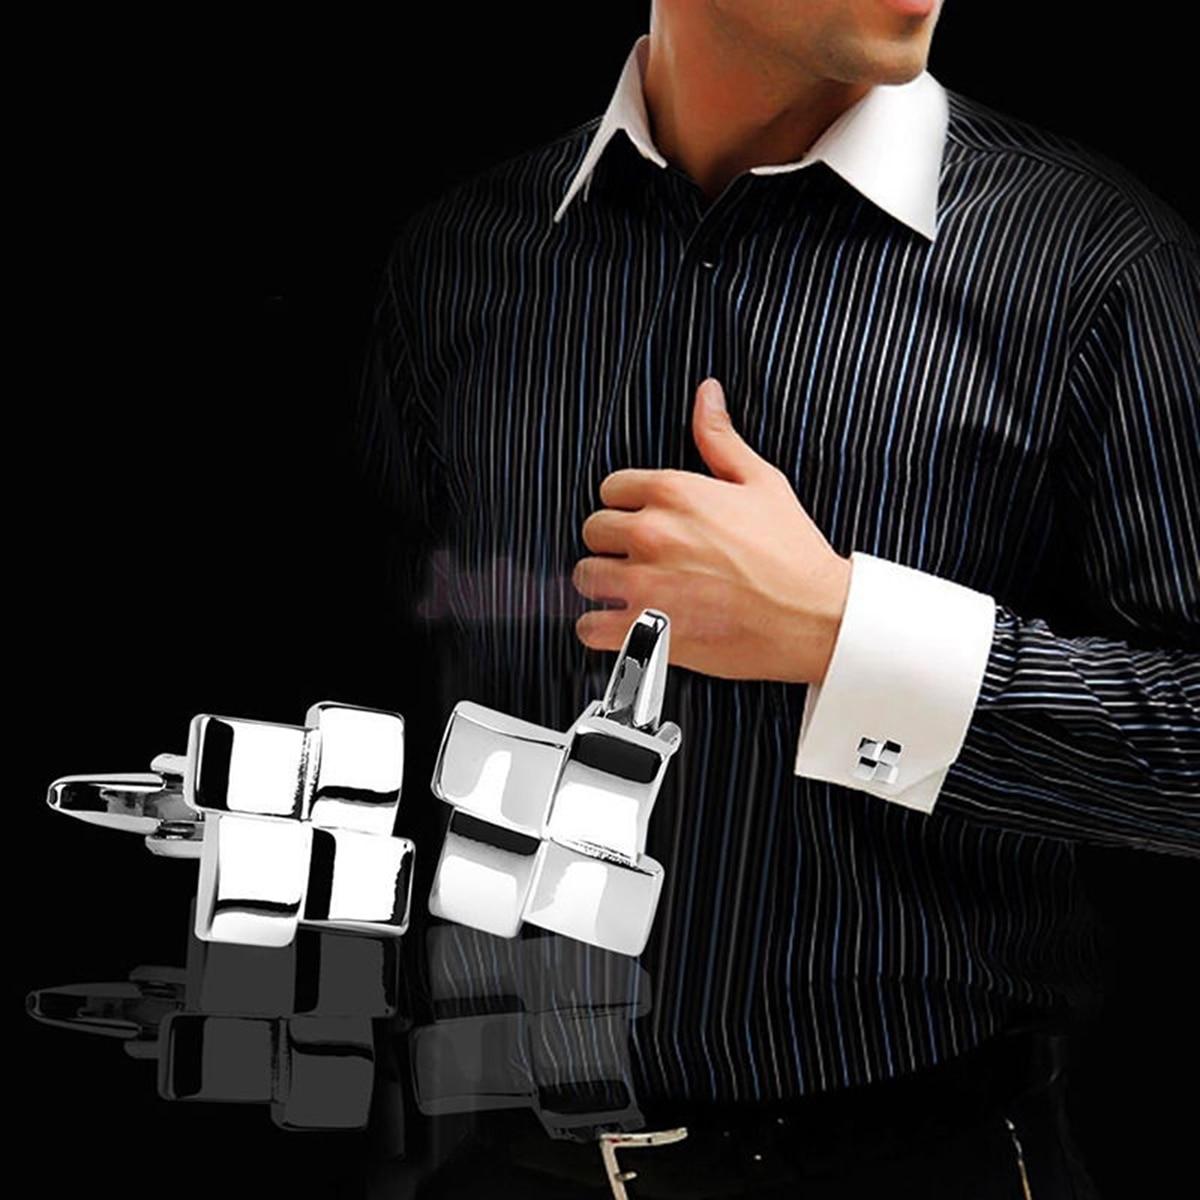 1 Pair Vintage Silver Cuffinks New Fashion Luxury Elegant French Shirt Cuffink Button For Men Women Bussiness Shirt Cuff Links